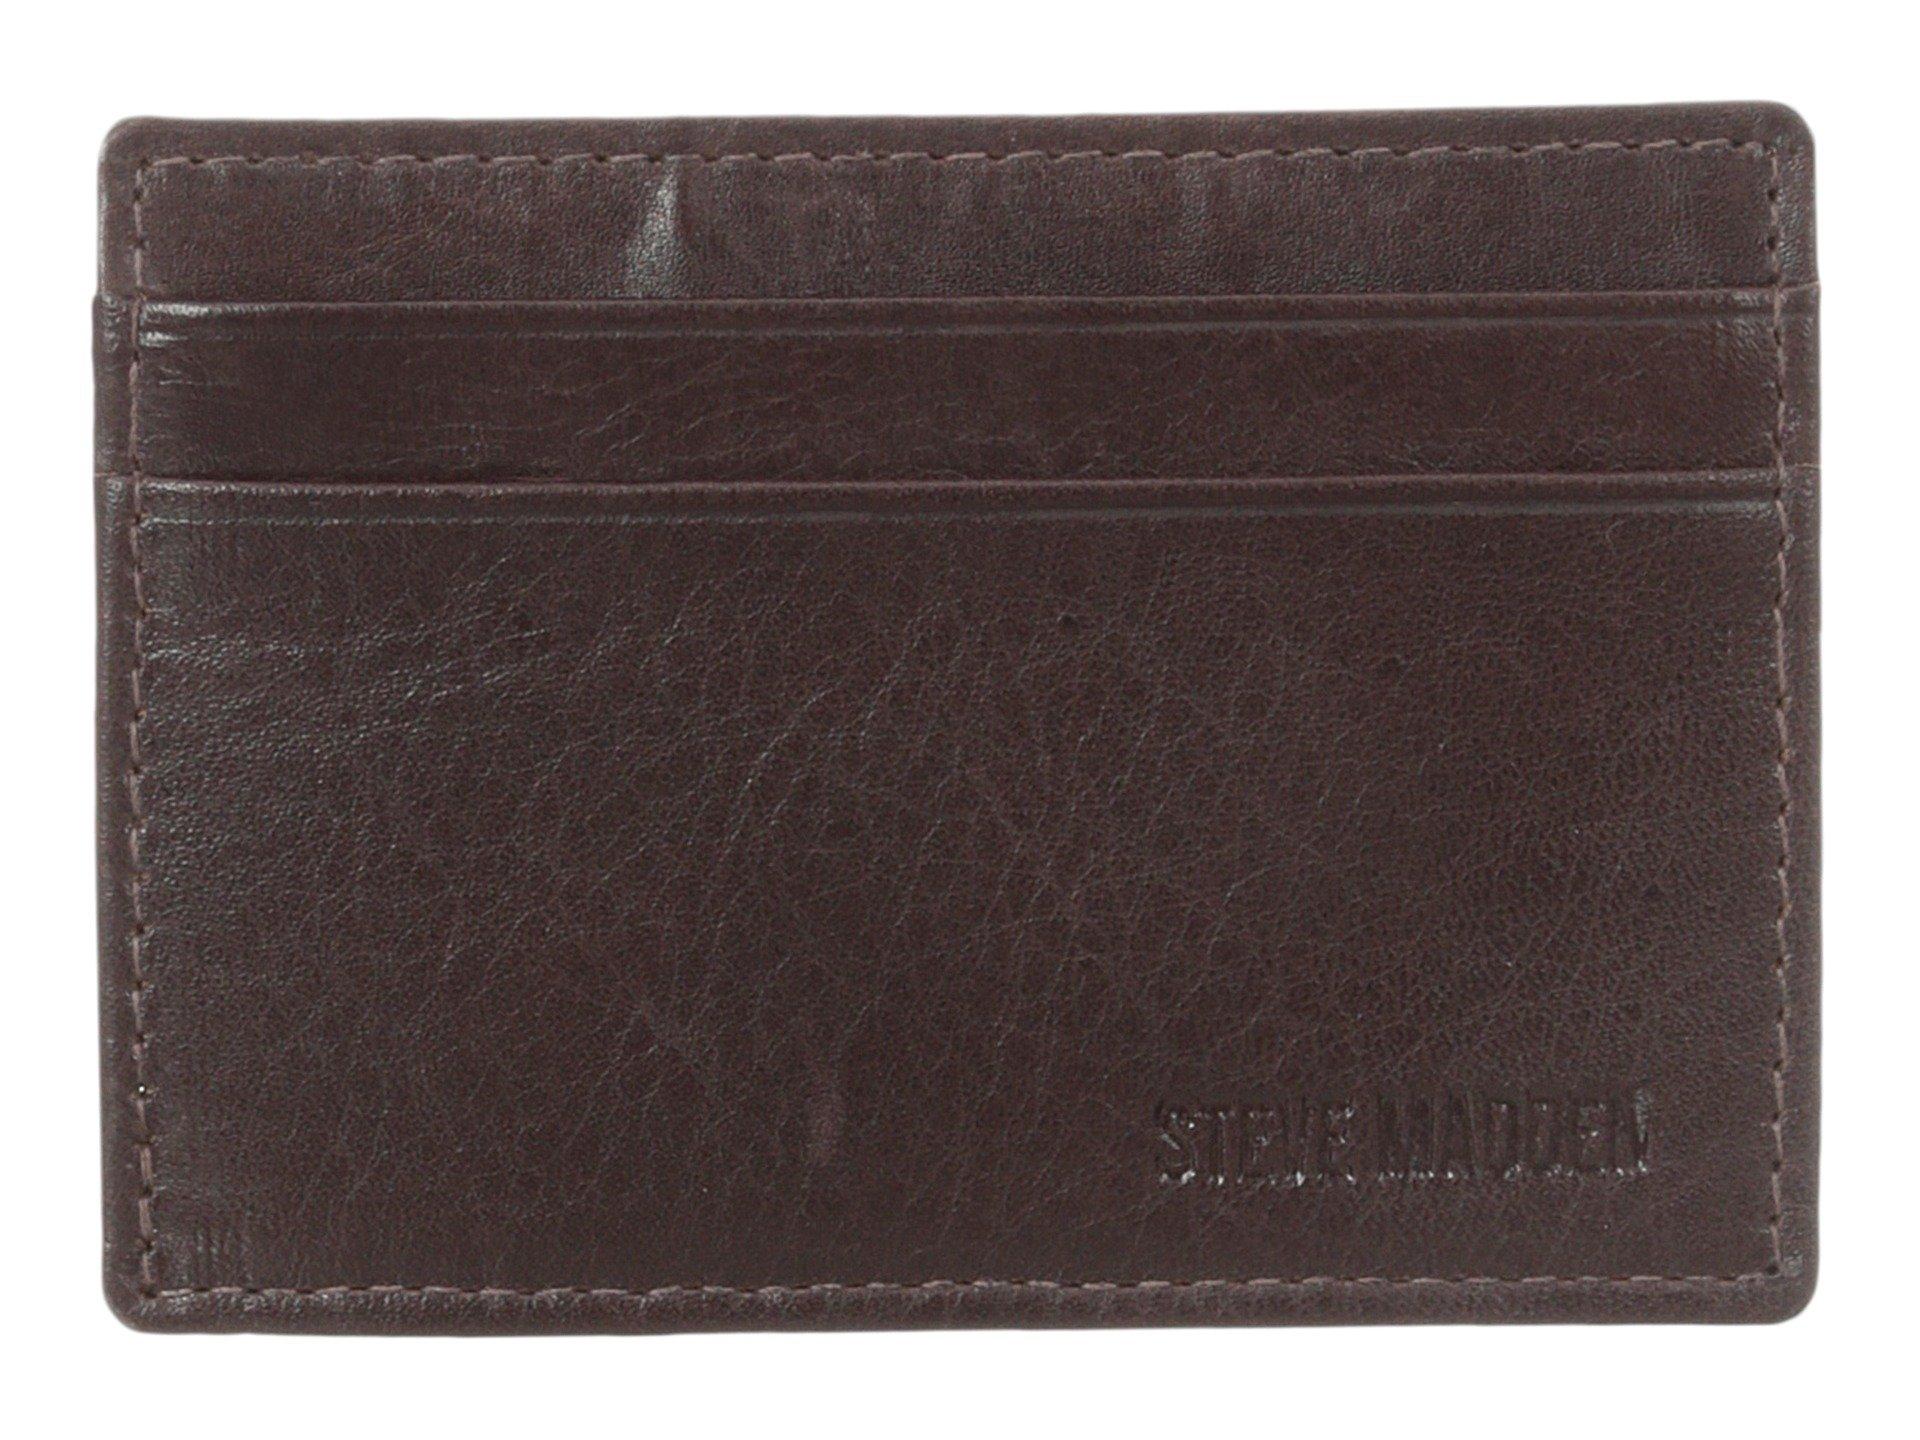 Monedero para Hombre Steve Madden Mealu Leather Card Carrier  + Steve Madden en VeoyCompro.net